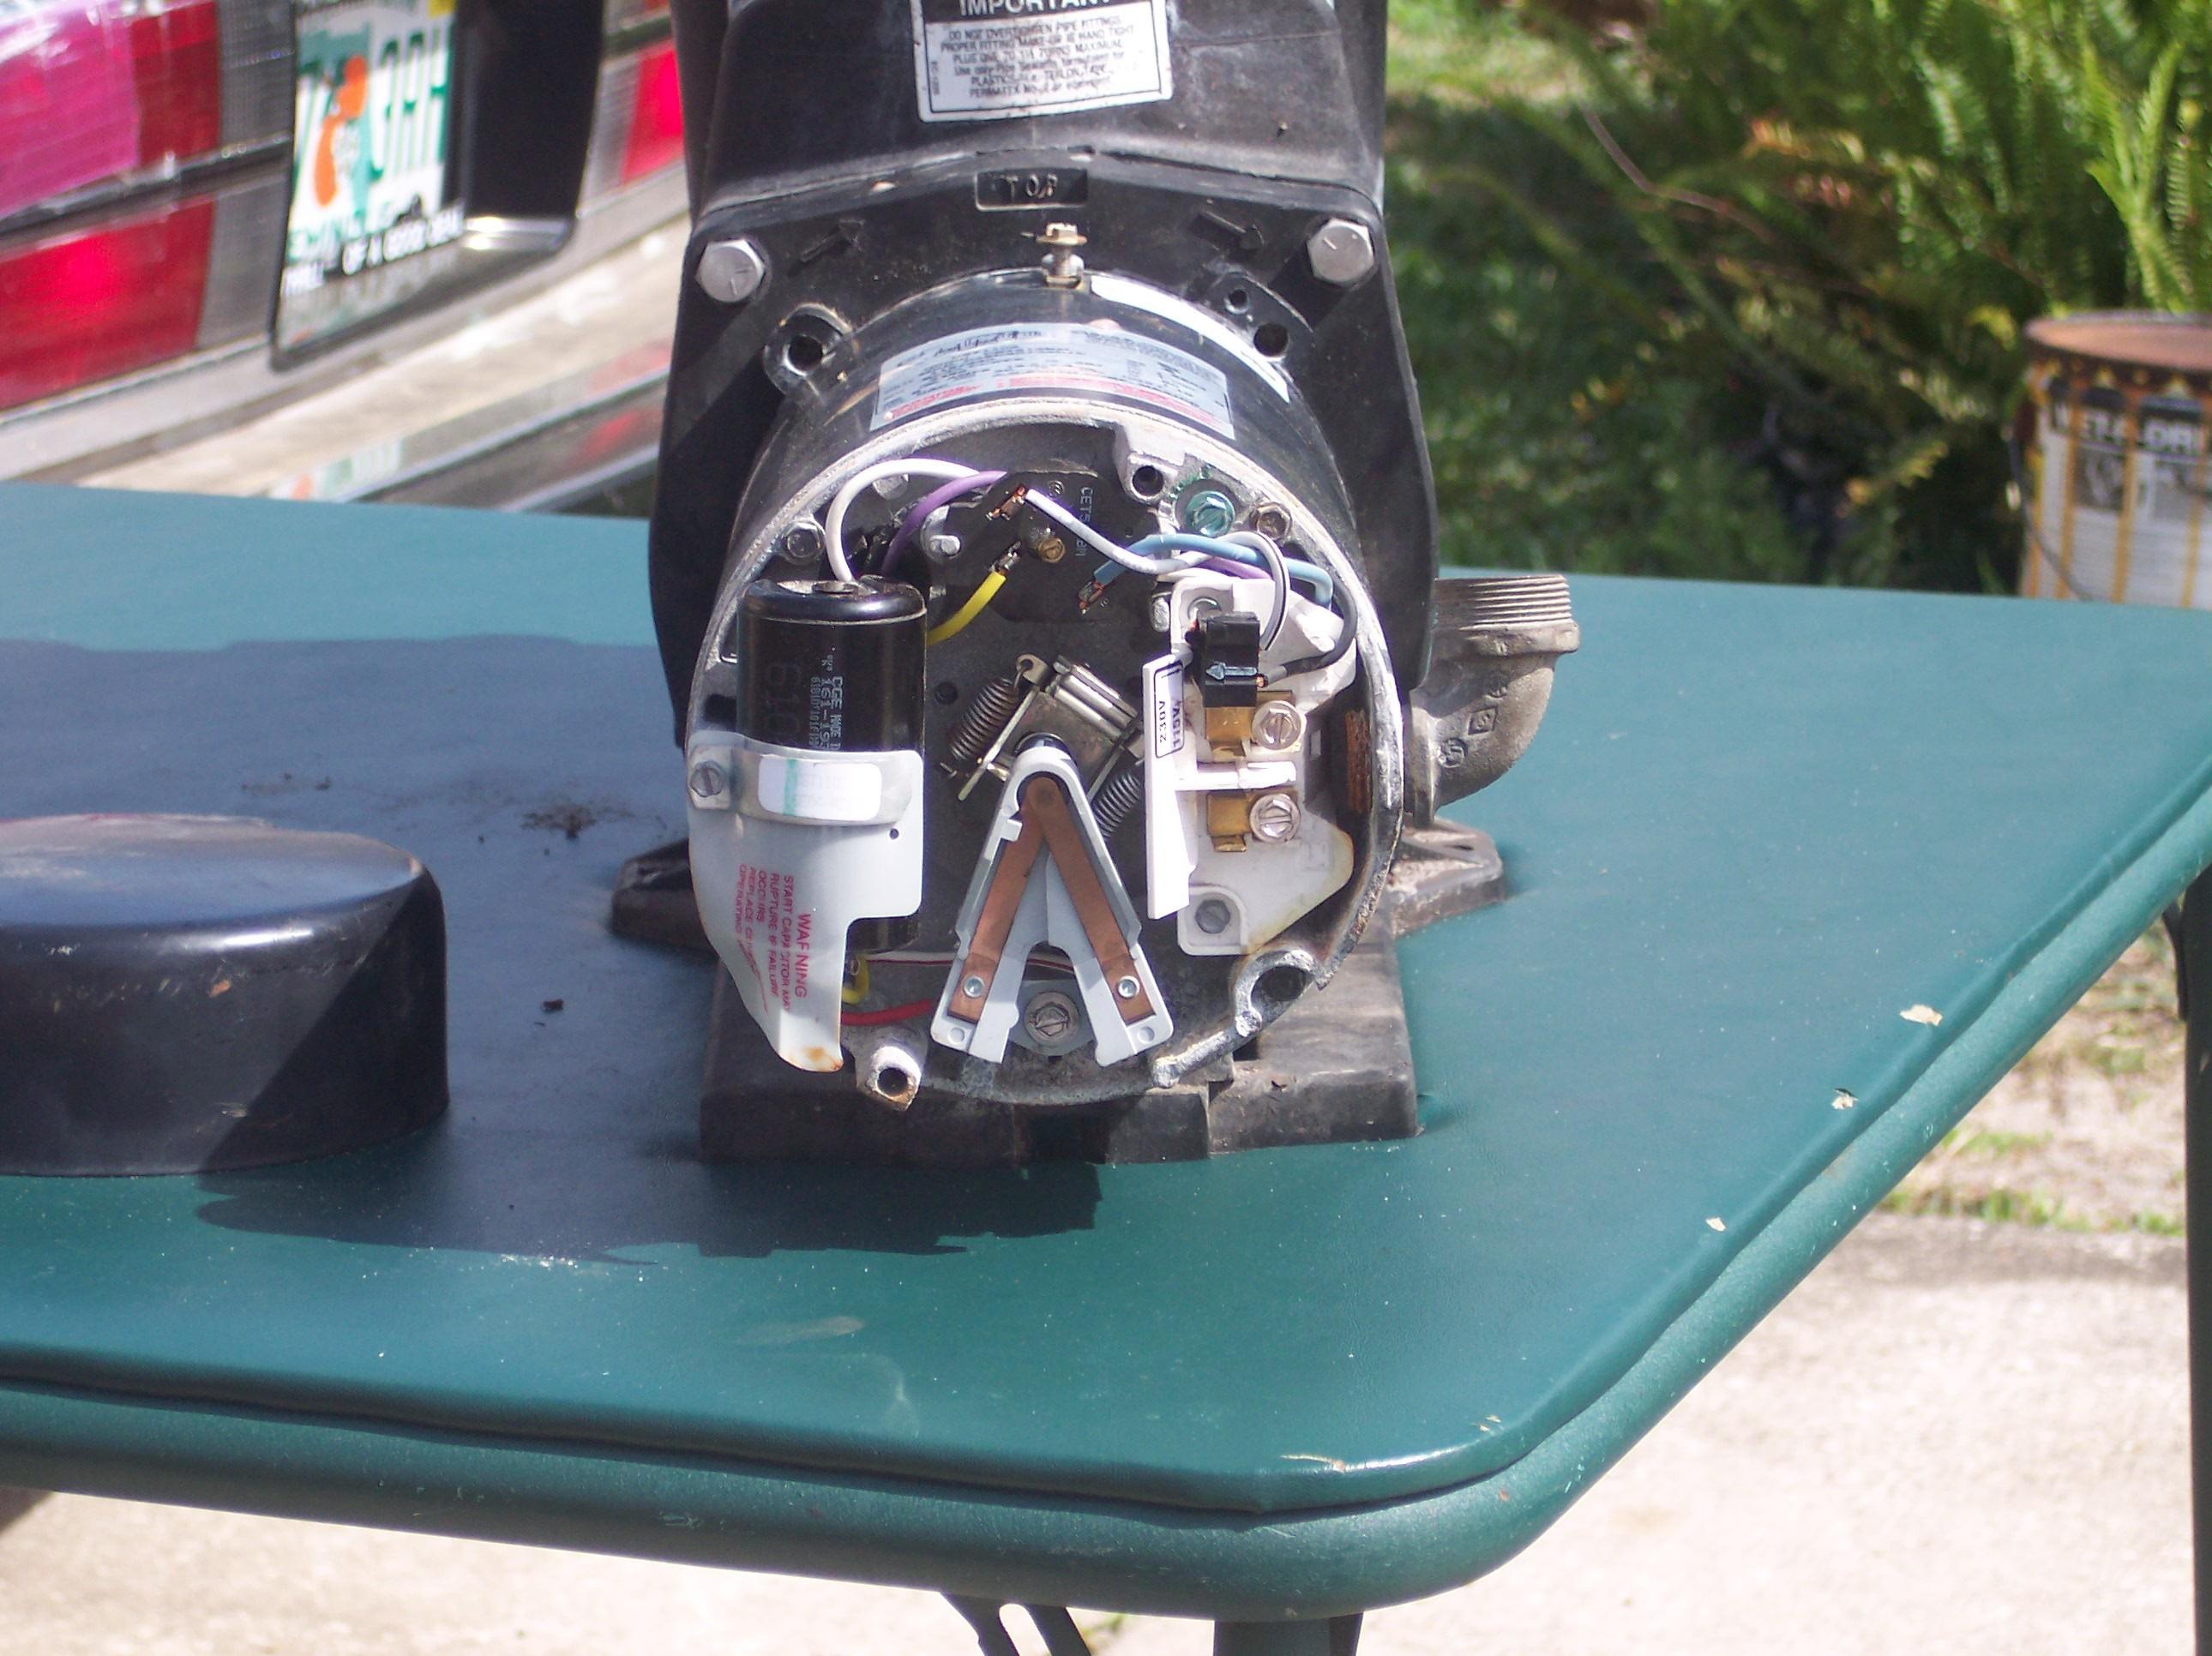 Ao Smith Pool Pump Motor Wiring Diagram Pump Motor Back Uncovered at Pool Wiring Diagram Newstongjl Of Ao Smith Pool Pump Motor Wiring Diagram